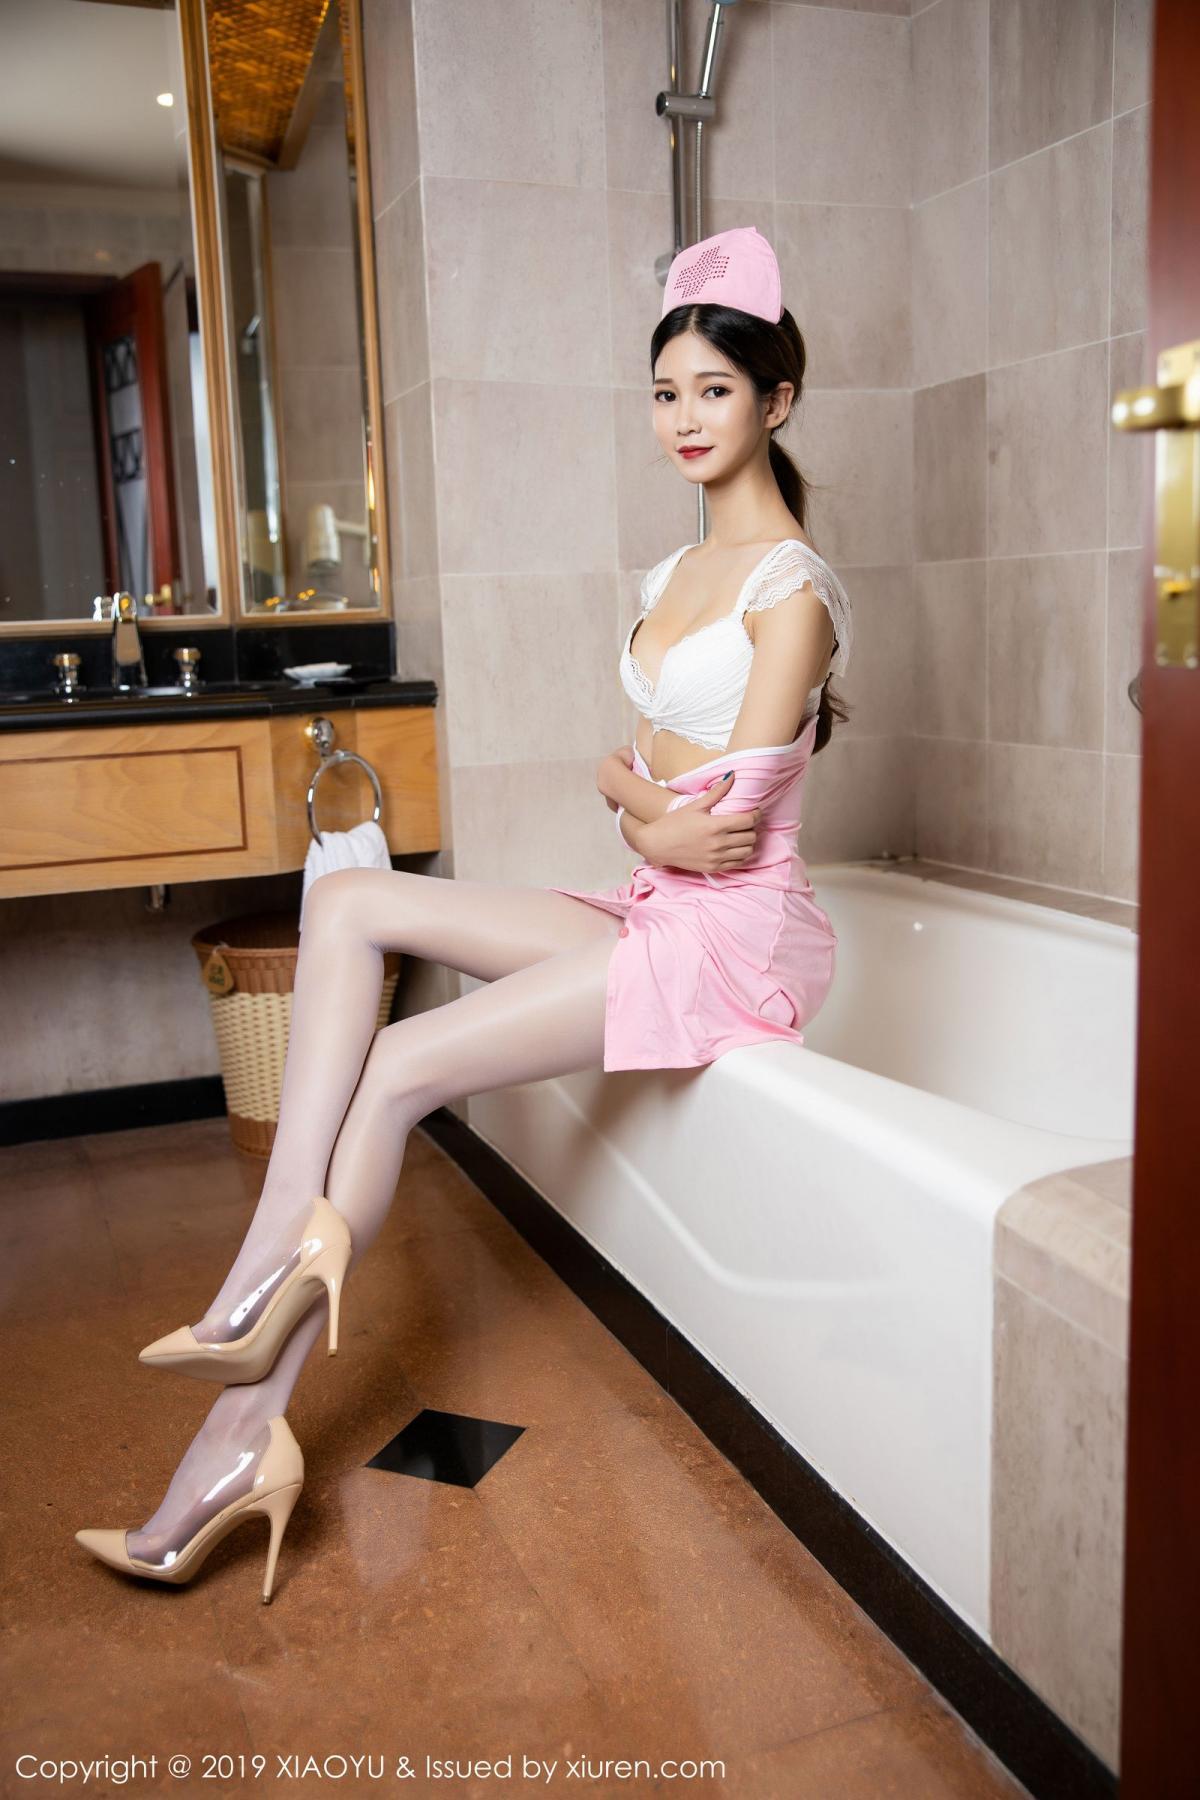 [XiaoYu] Vol.218 Cheng Cheng Cheng 19P, Cheng Cheng Cheng, Nurse, Tall, XiaoYu